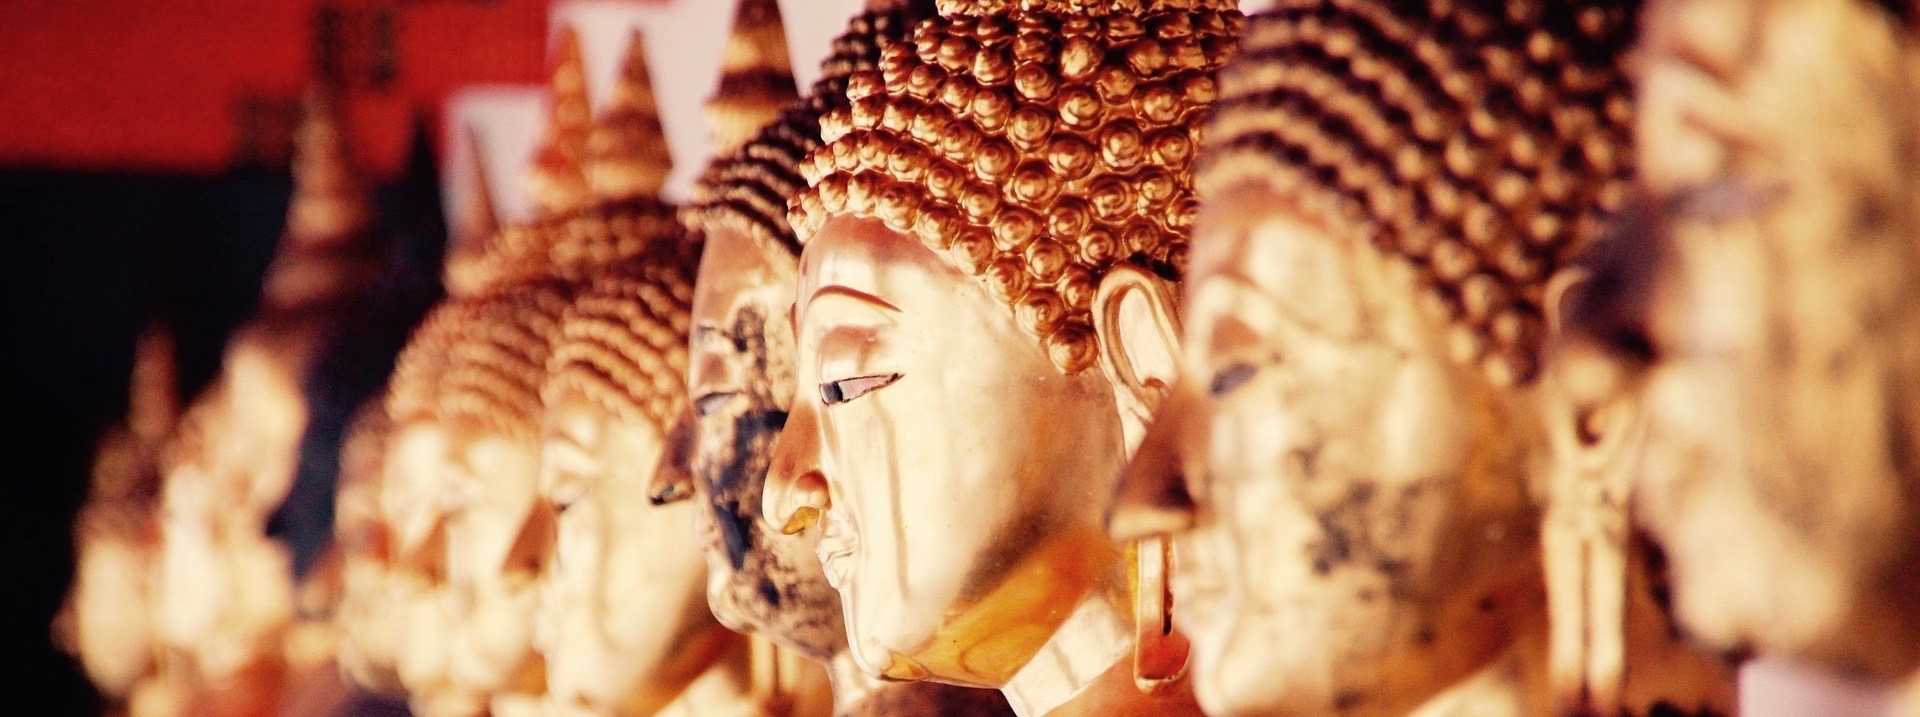 http://milletours.com/new/wp-content/uploads/2017/06/thailande.jpg